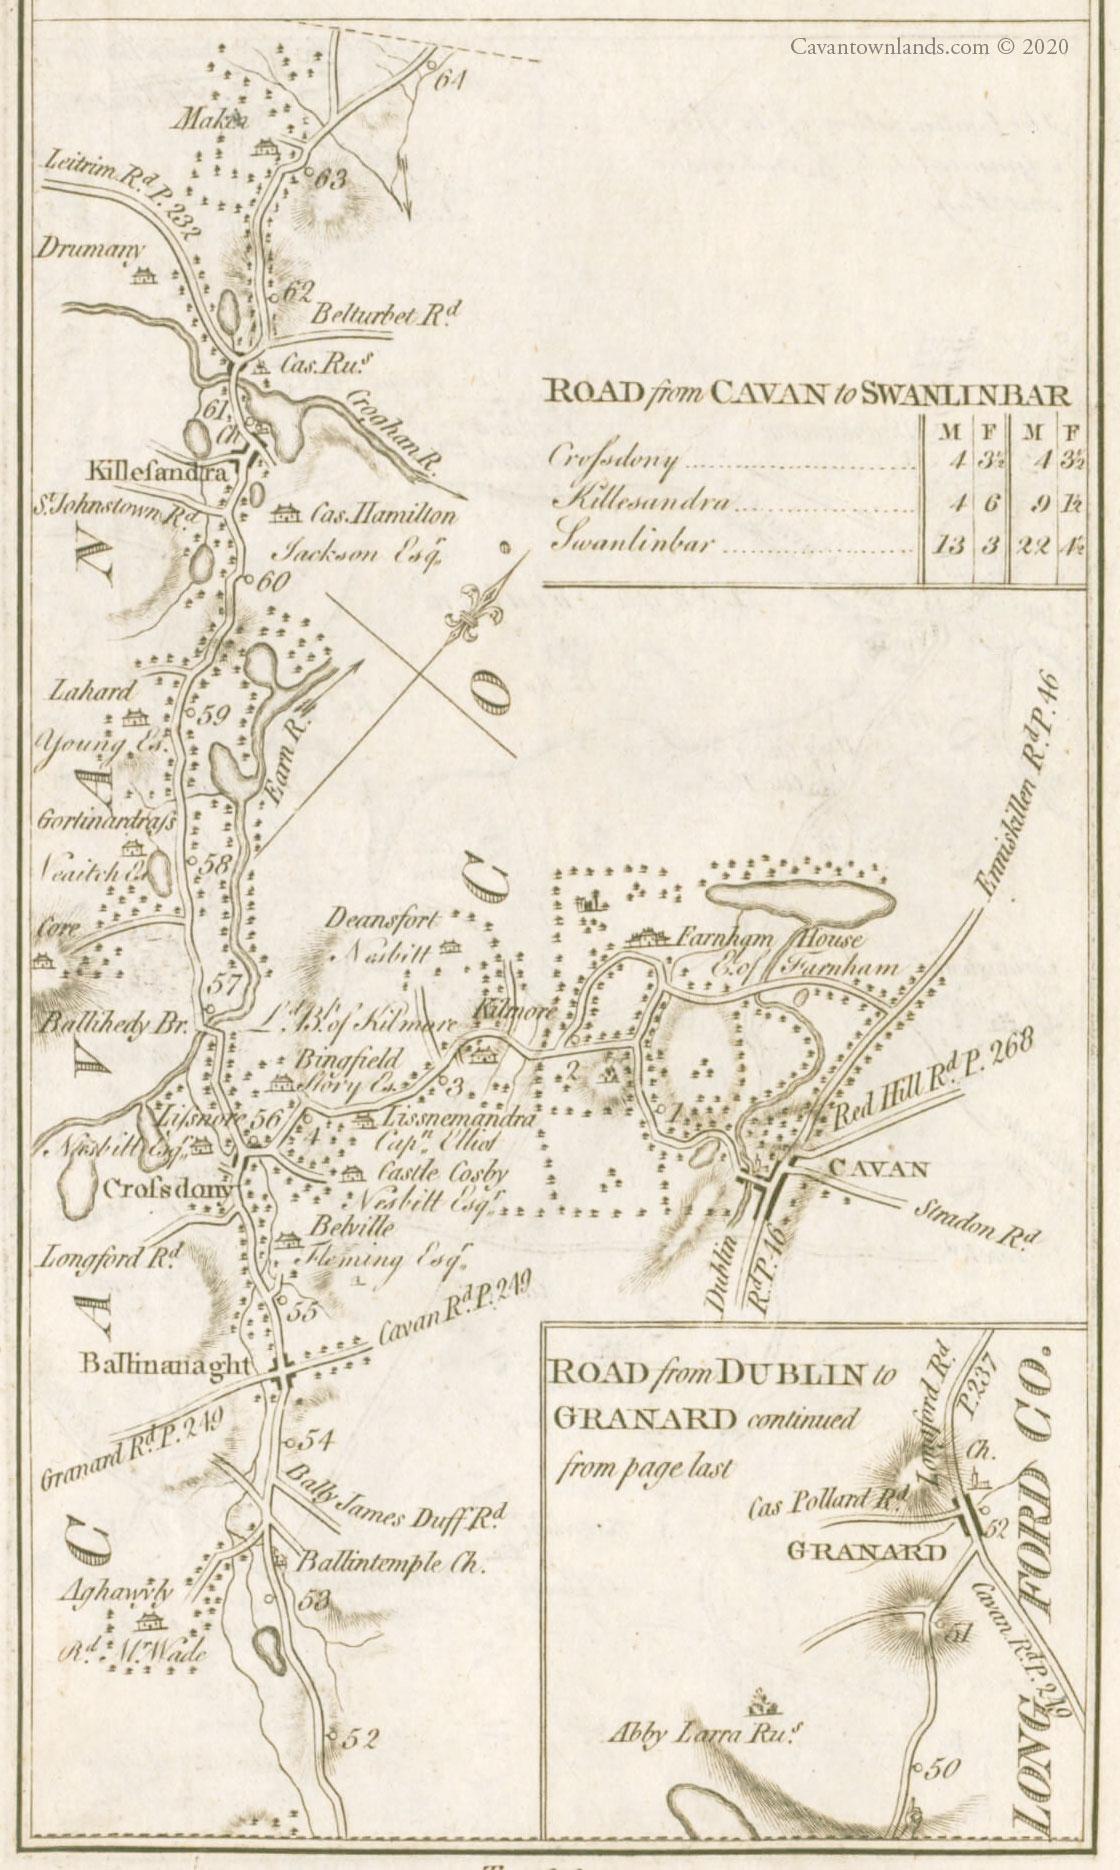 58-Cavan-Killeshandra-Ballinagh-CT